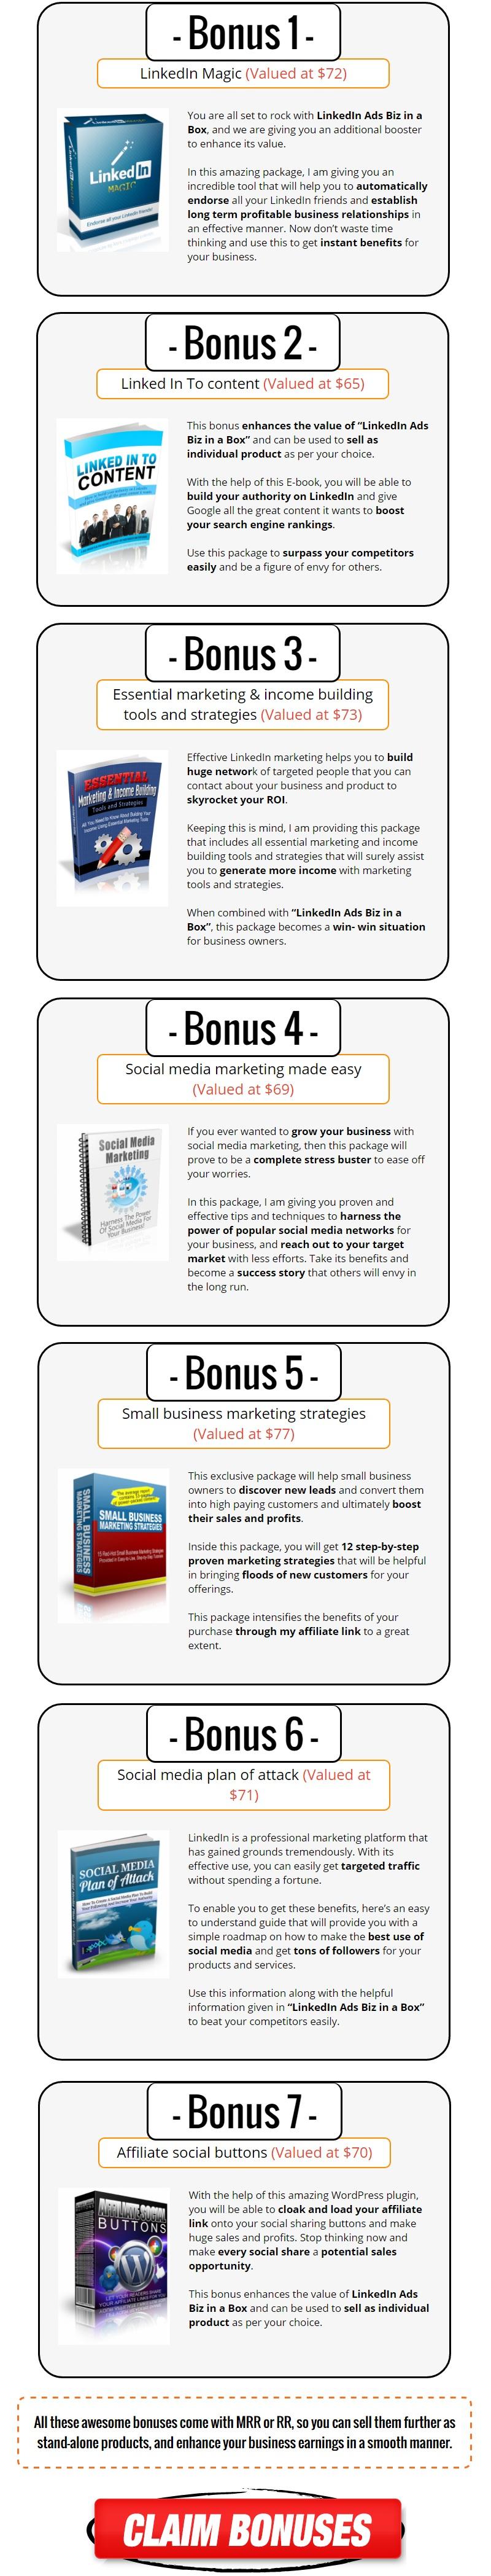 LinkedProfits Bonus